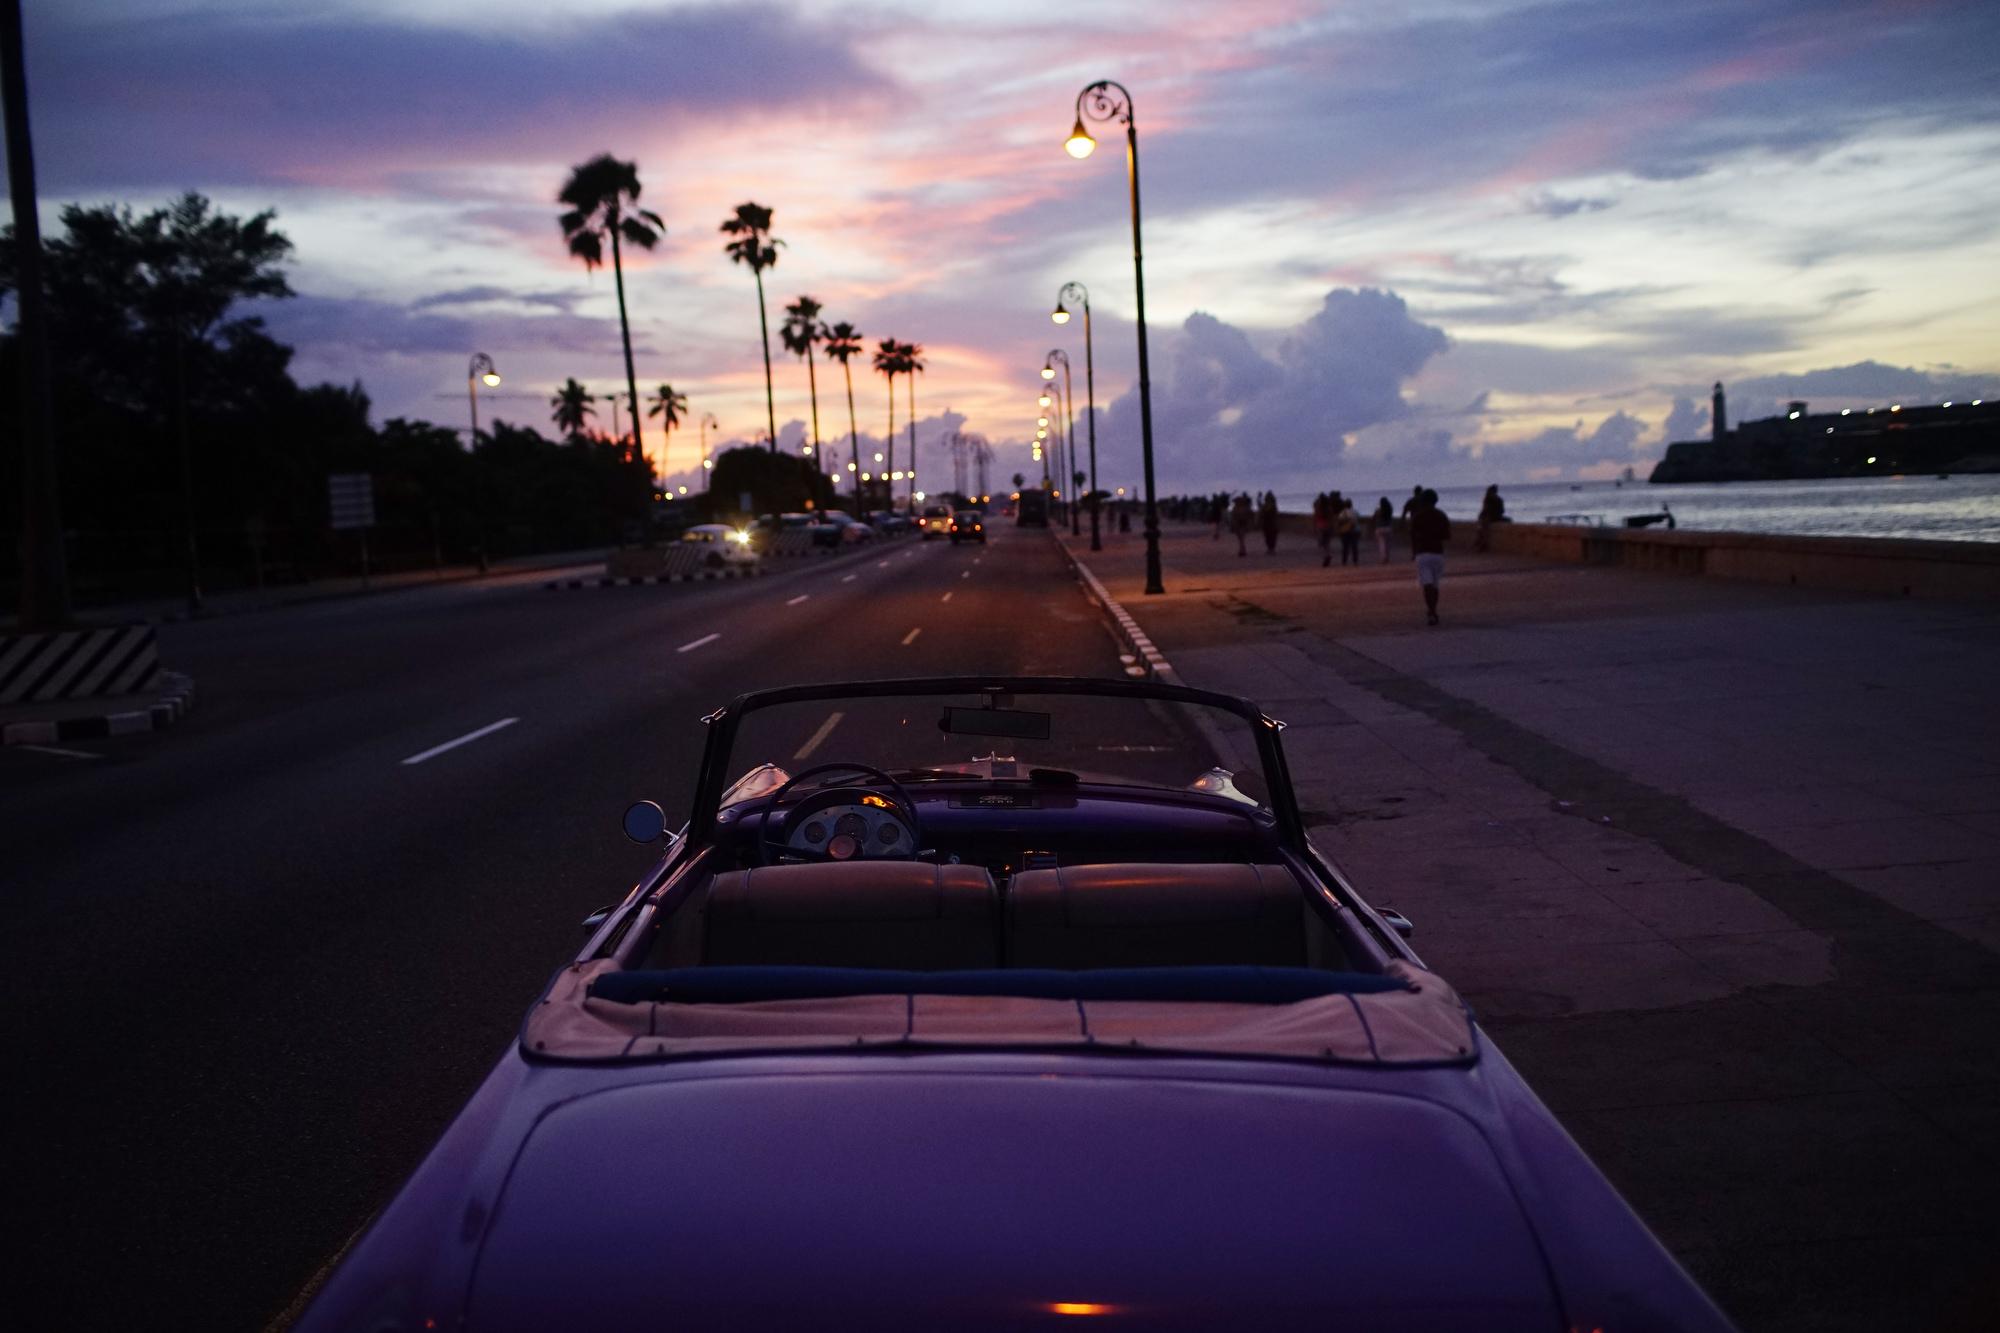 Cuba: Idle Time - series